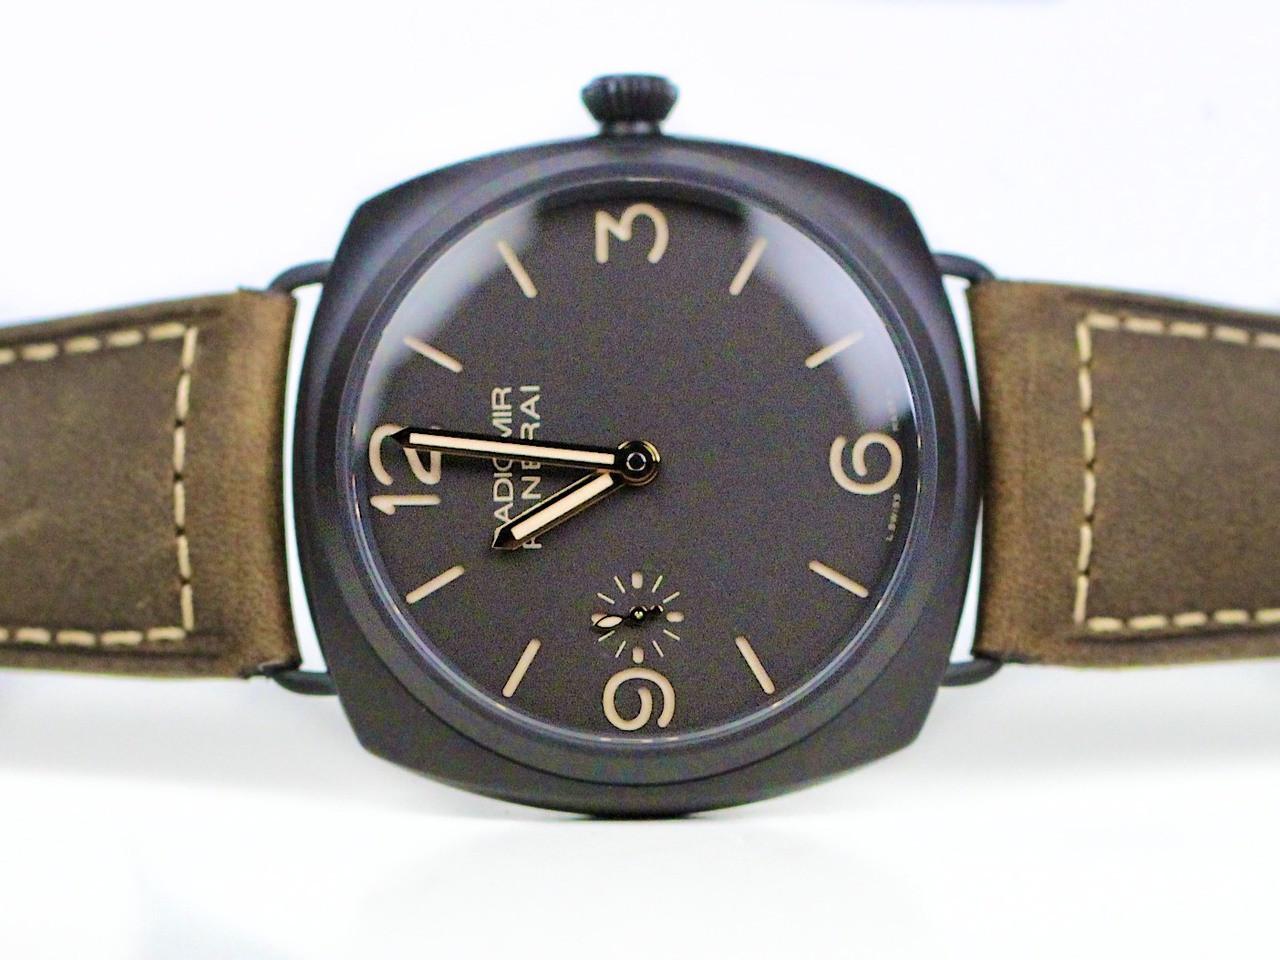 New Panerai Watch - Radiomir Composite 3 Days PAM 504 www.Legendoftime.com - Chicago Watch Center